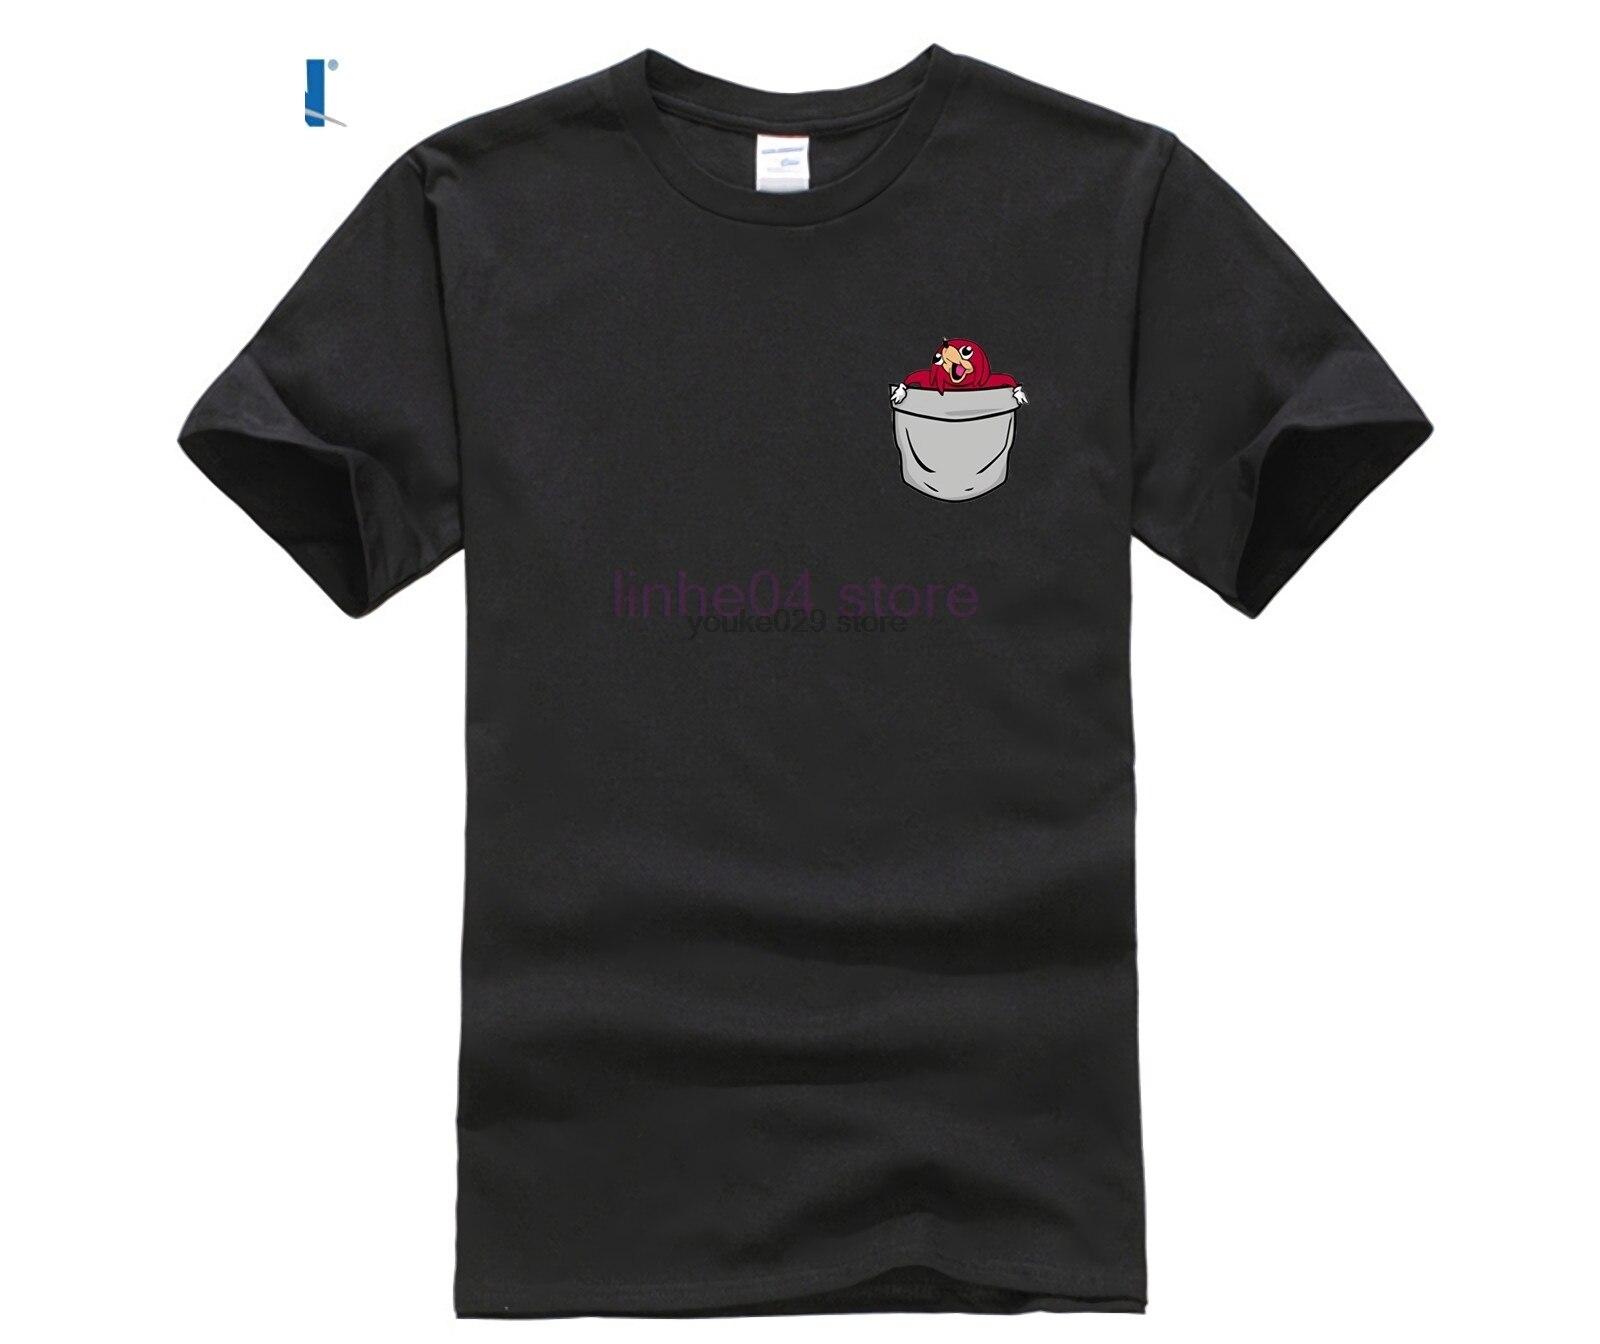 2019 Latest Design Graphic Tshirt Men Uganda Knuckles Pocket T Shirt Plus Size Raglan Sleeve O-neck New Fashion Summer Tops Tees